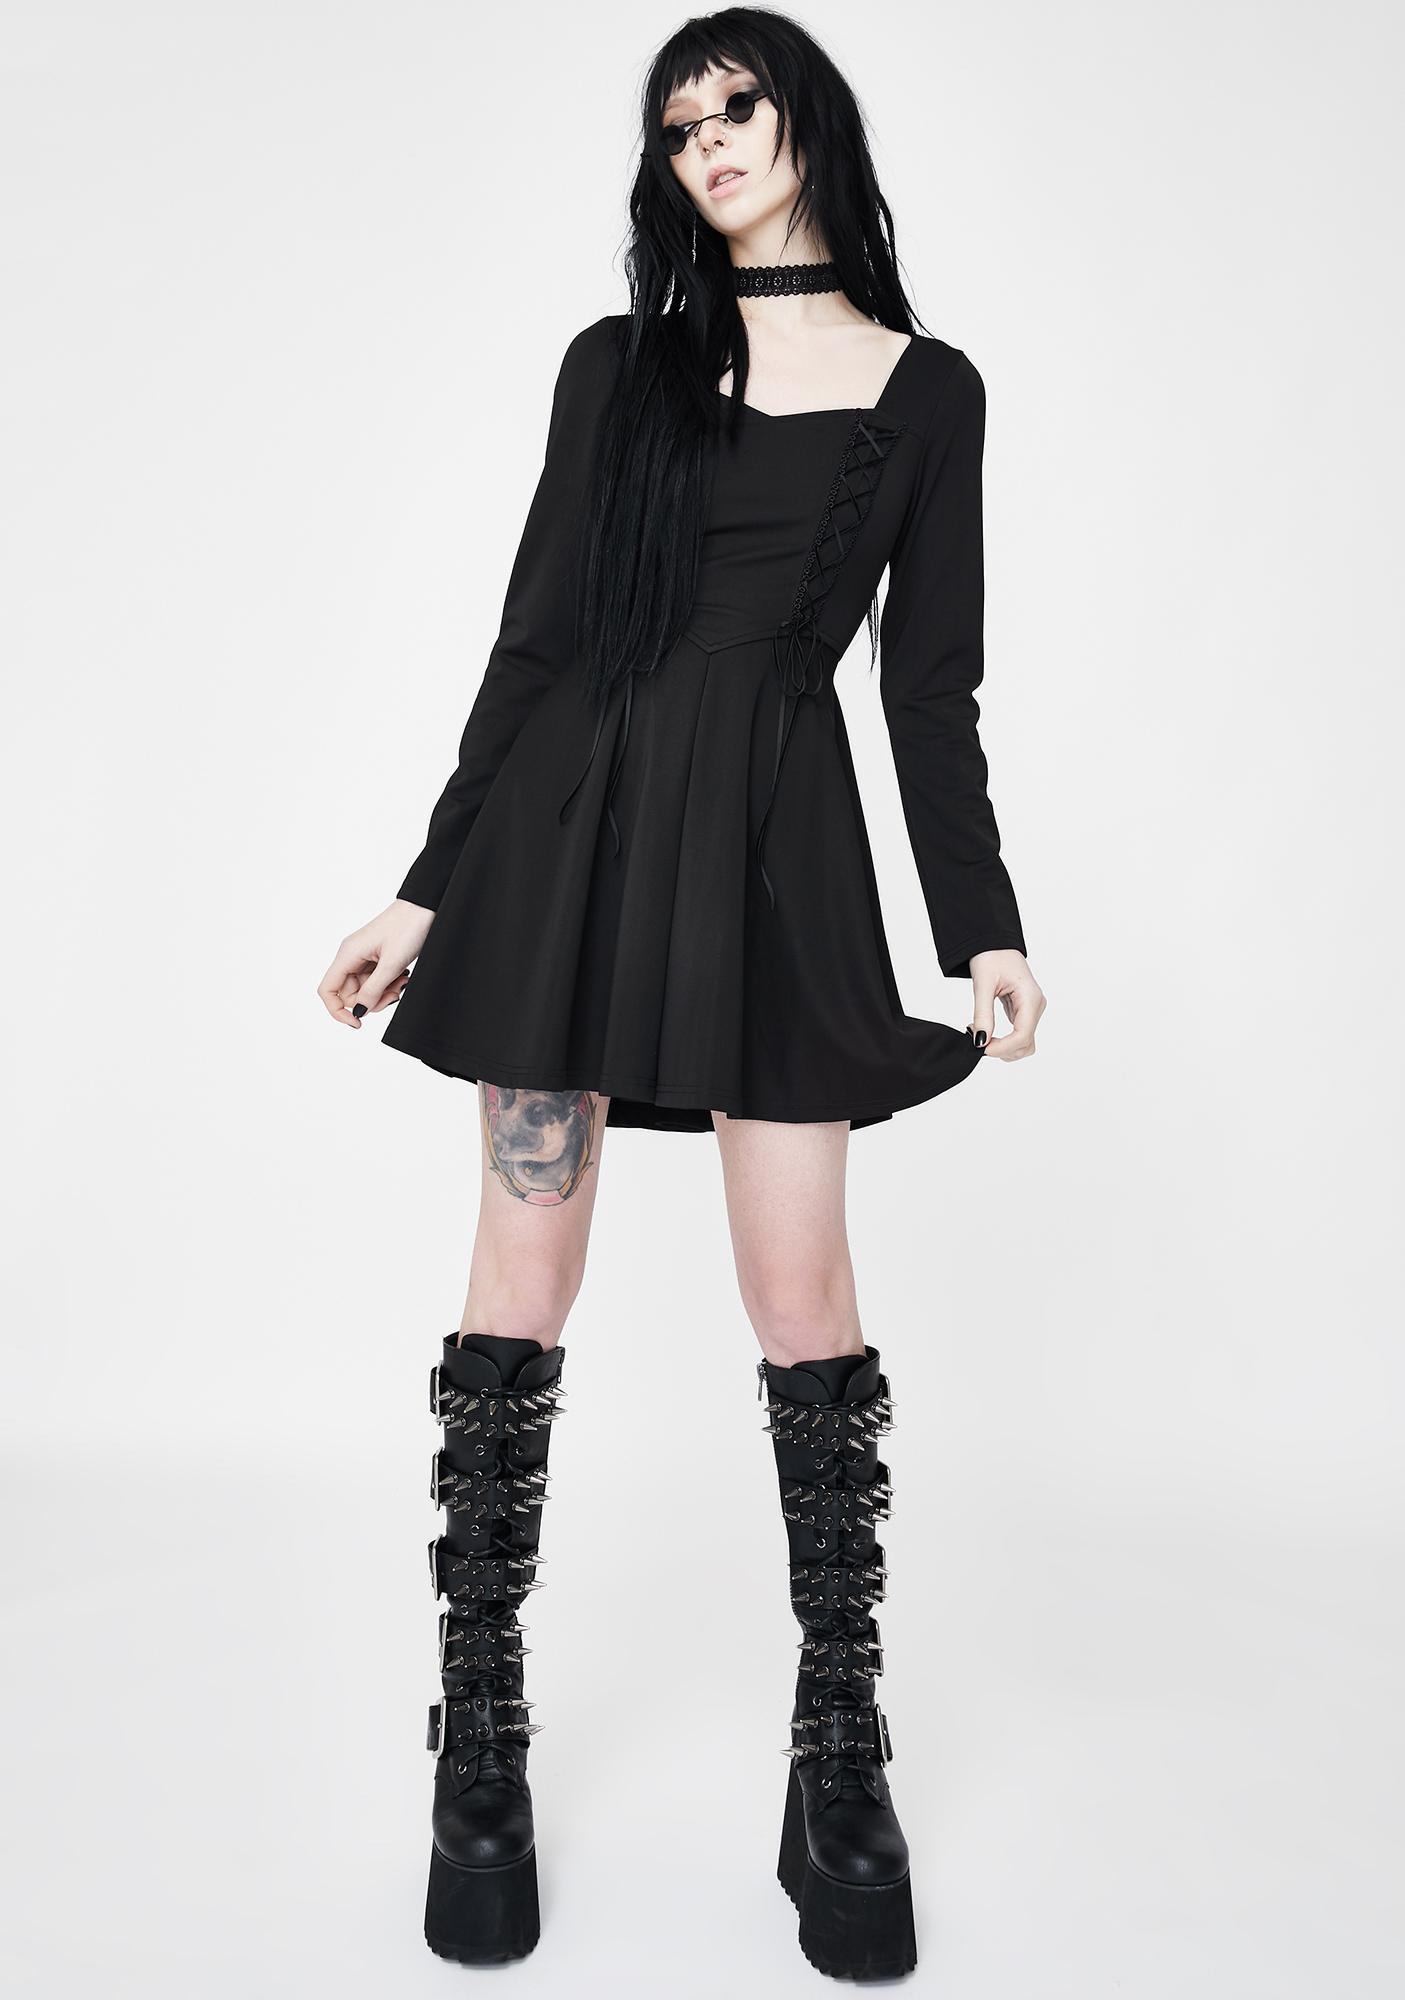 Punk Rave Lace Up Sweetheart Mini Dress